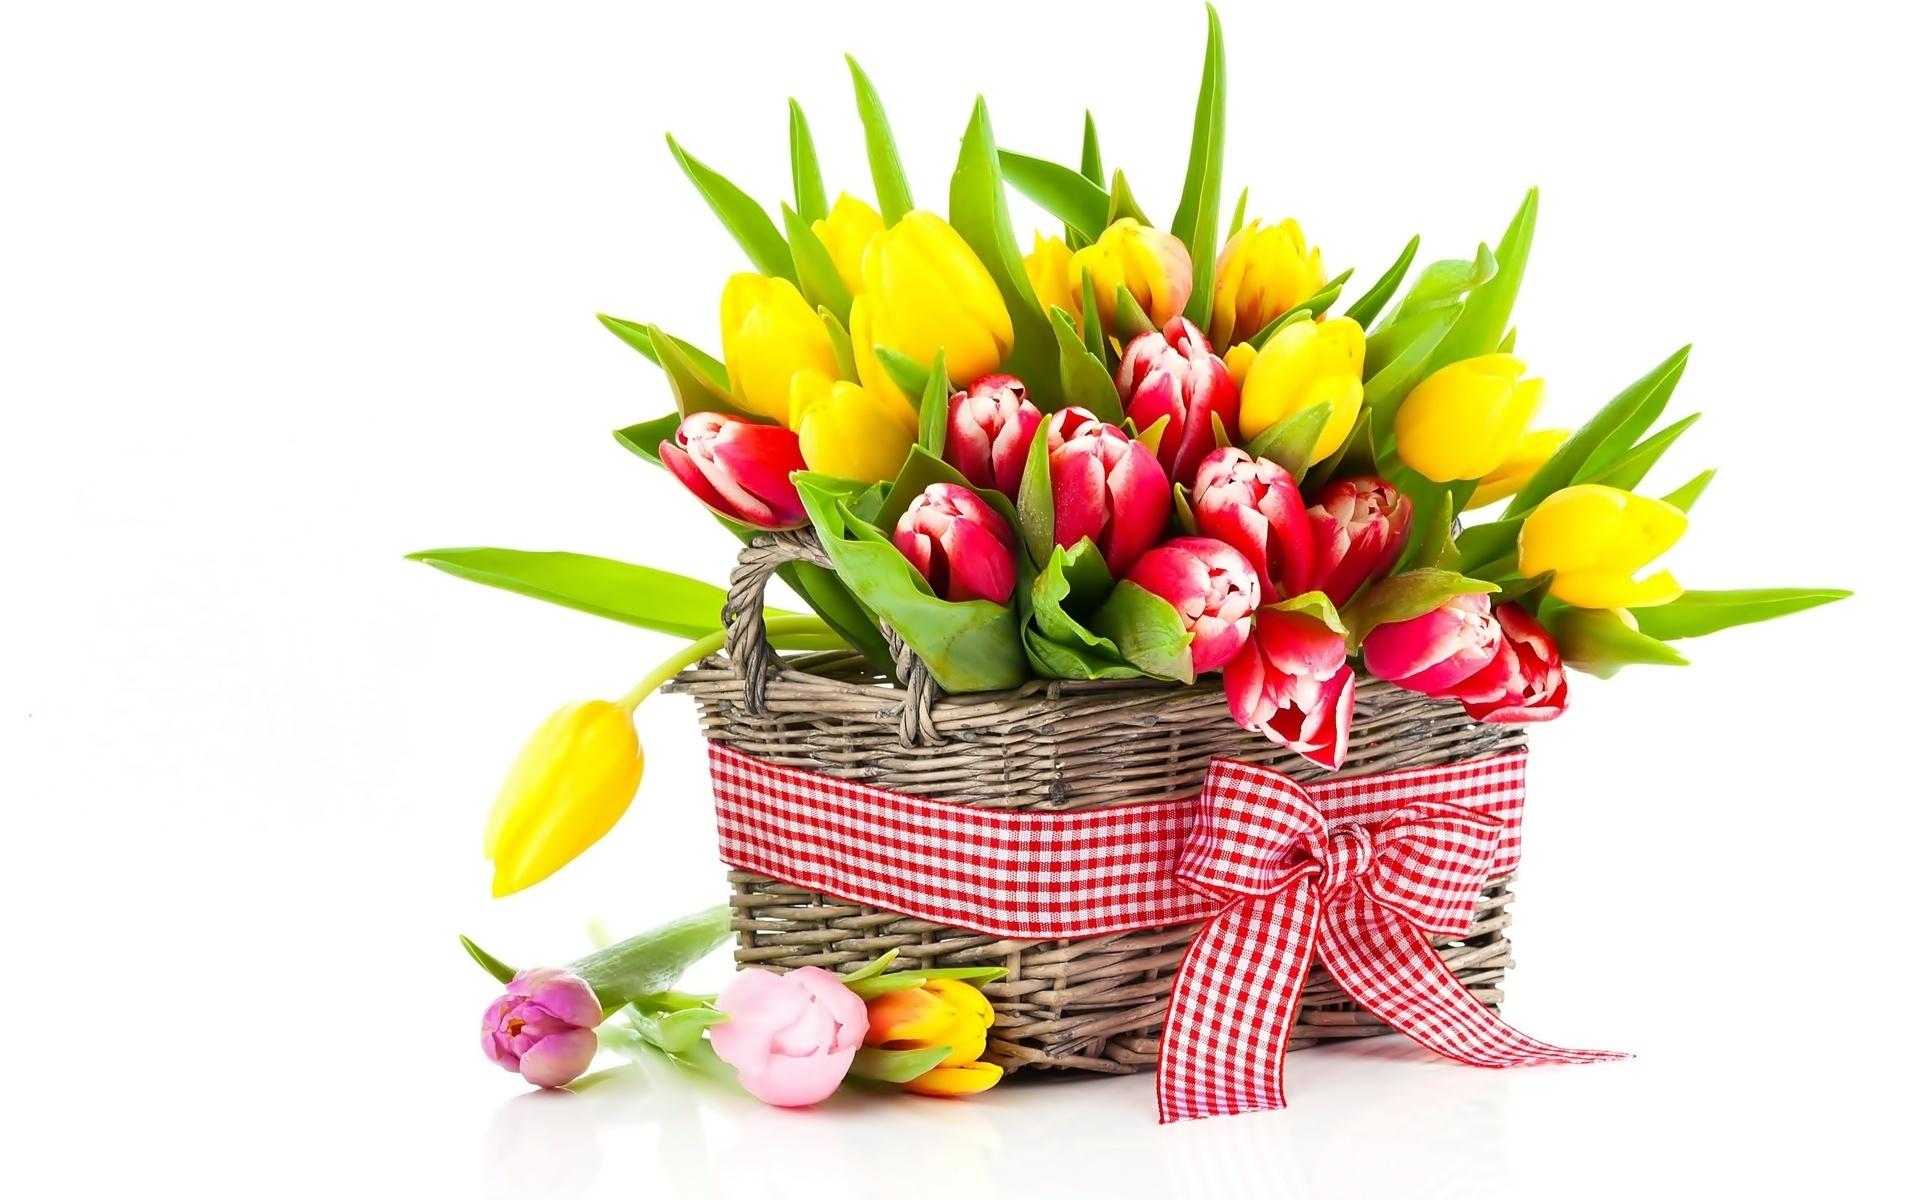 Цветы обои фото картинки на рабочий стол